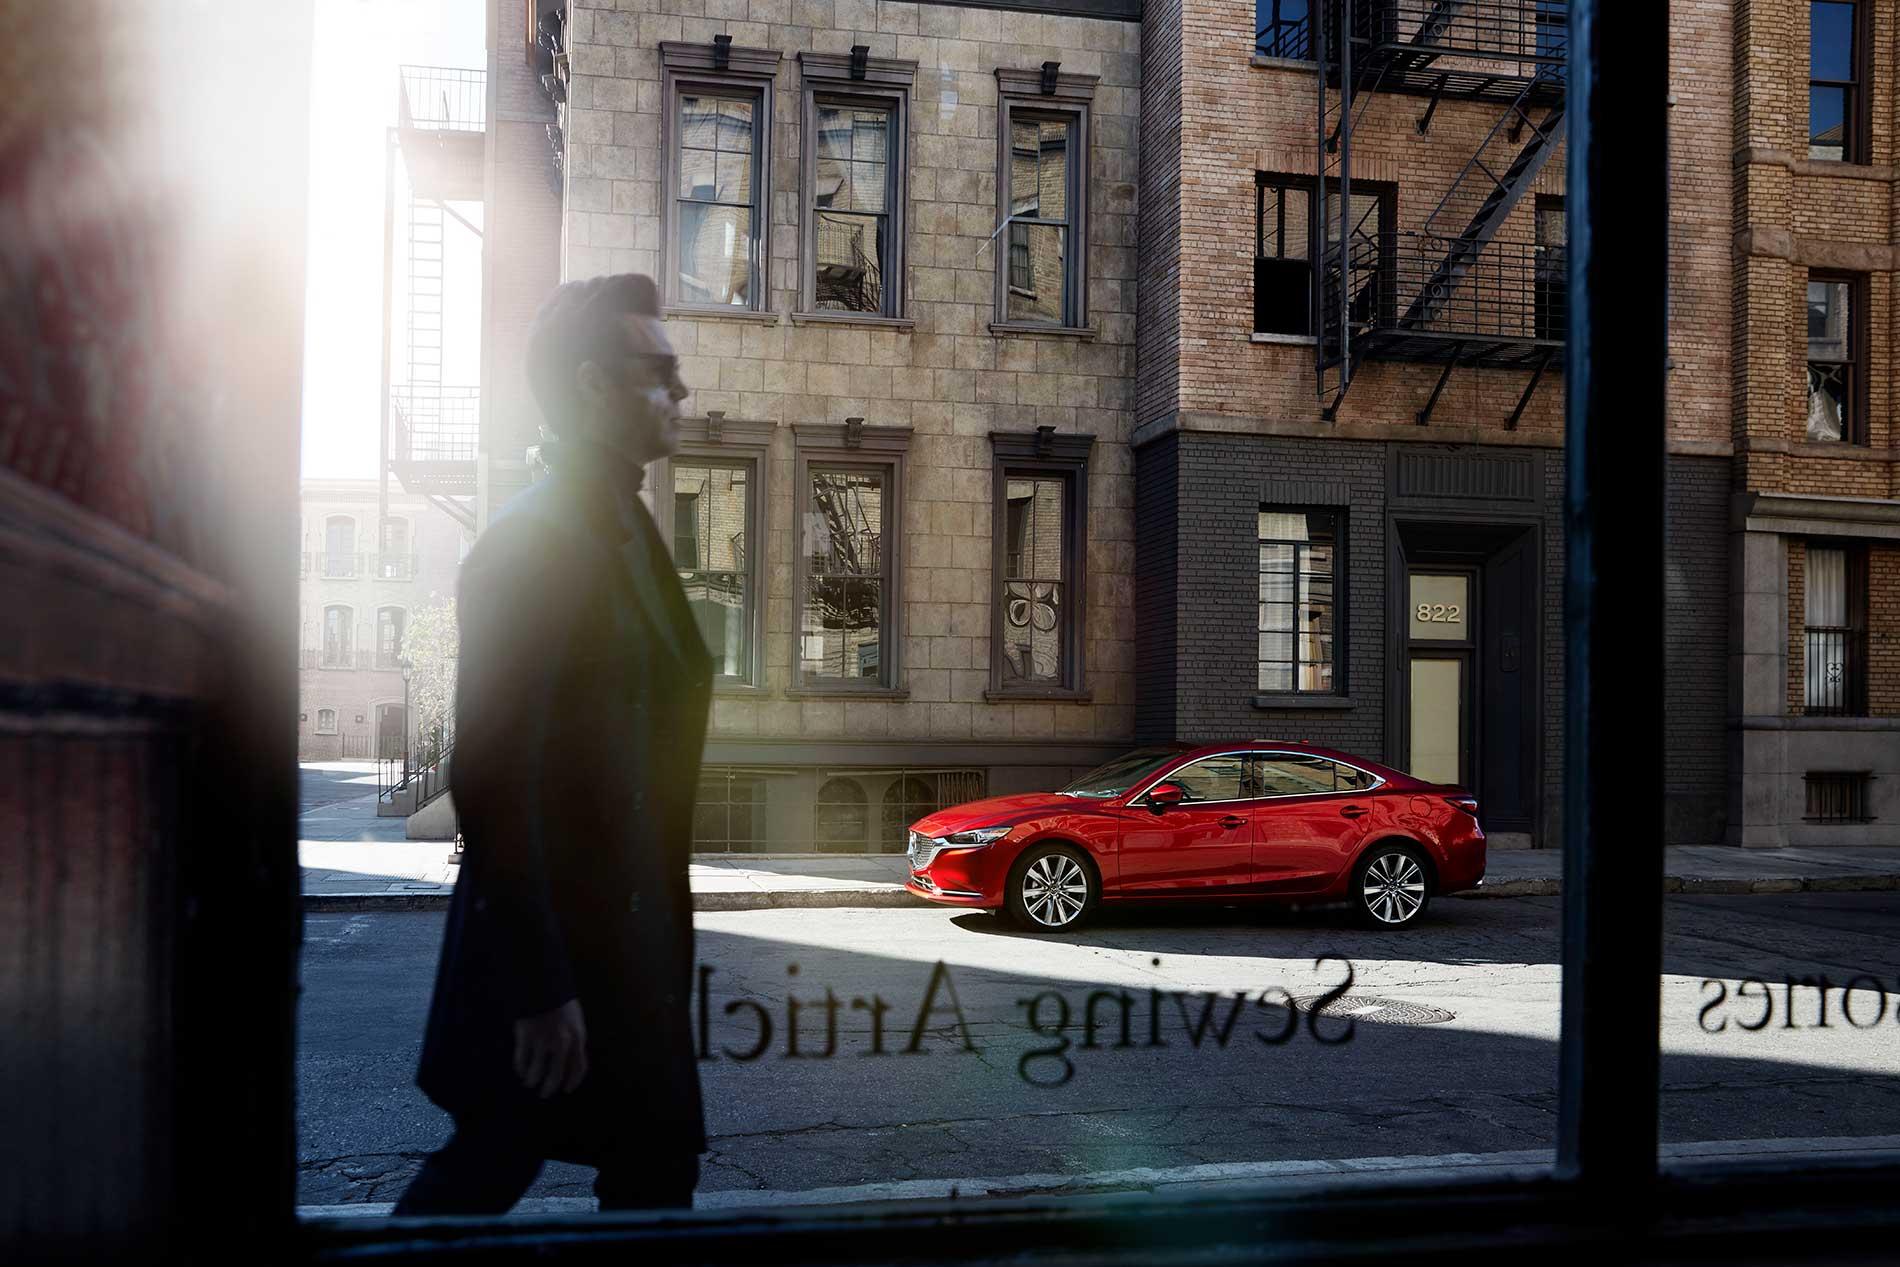 Client: Mazda Photographers: Patrick + Marlyne Curtet  Agency: Garage Team Mazda